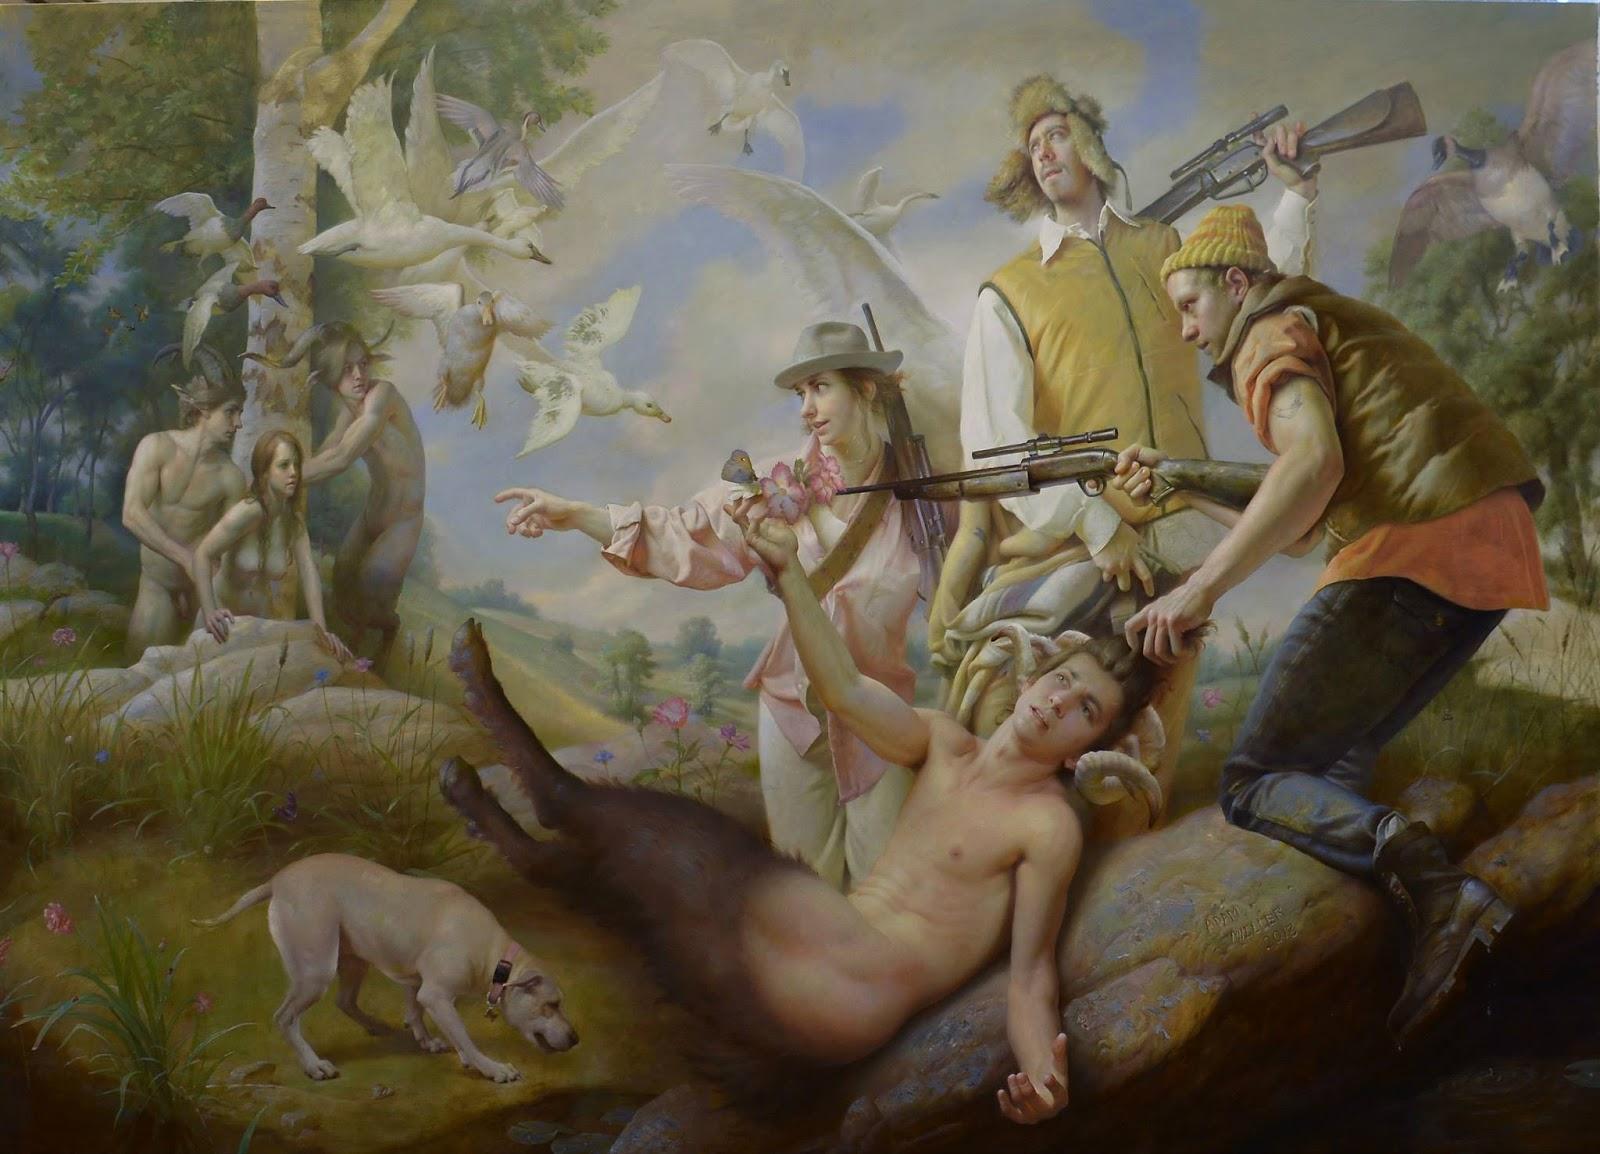 Erotic paintings of andrzej malinowski - 2 3